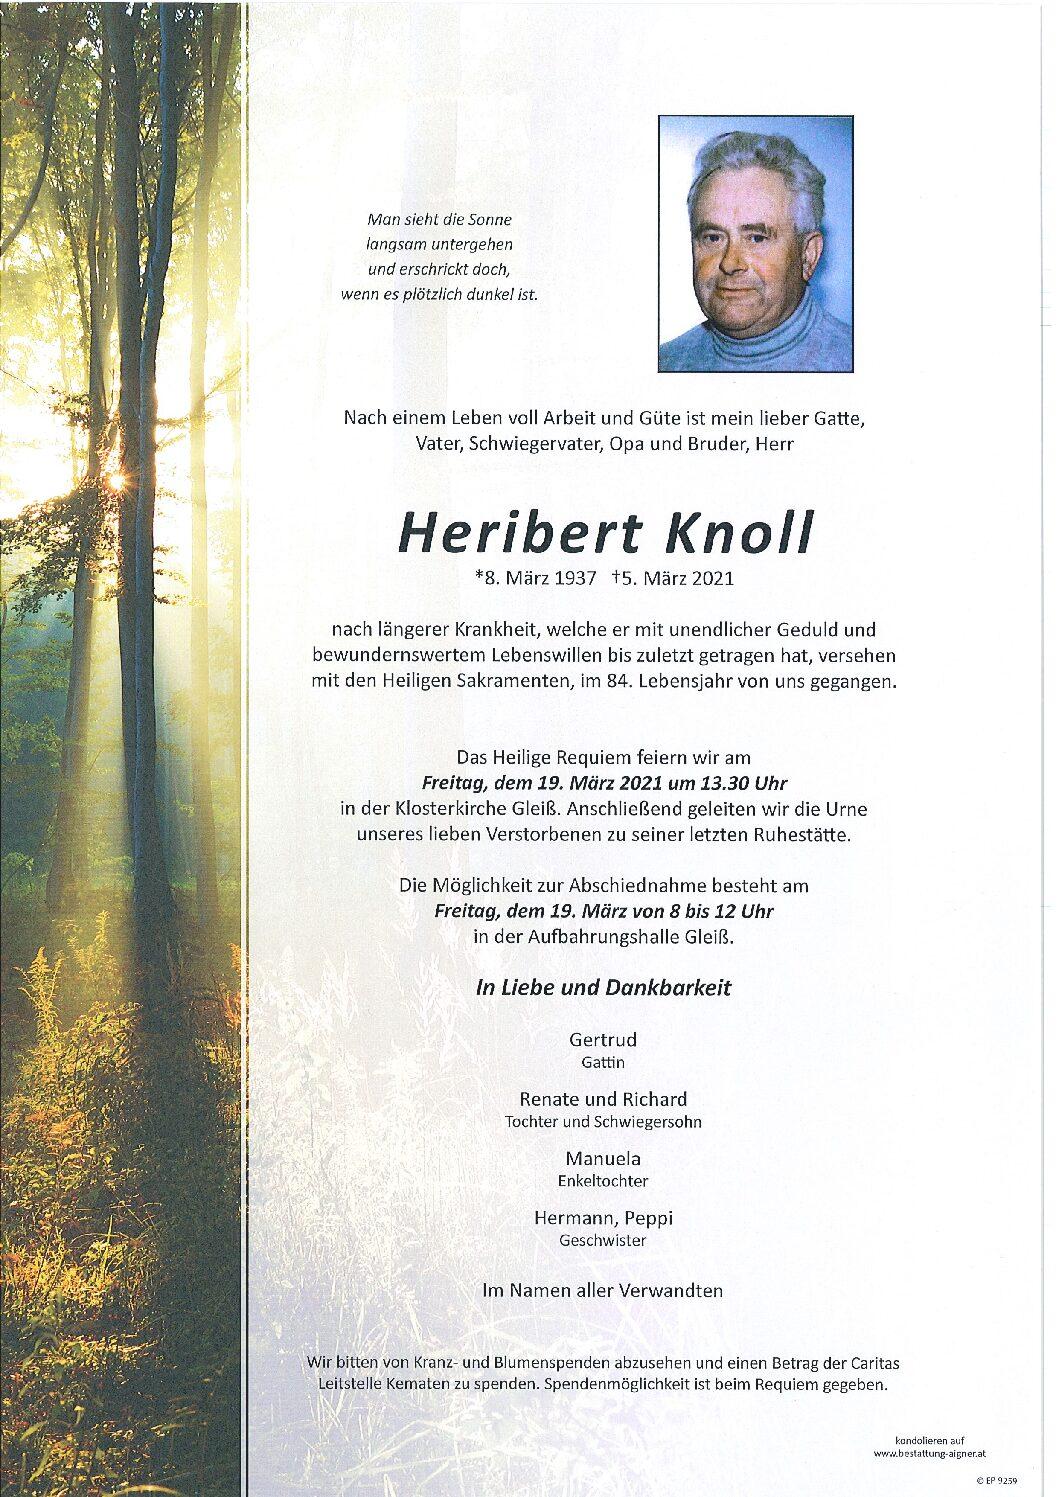 Heribert Knoll